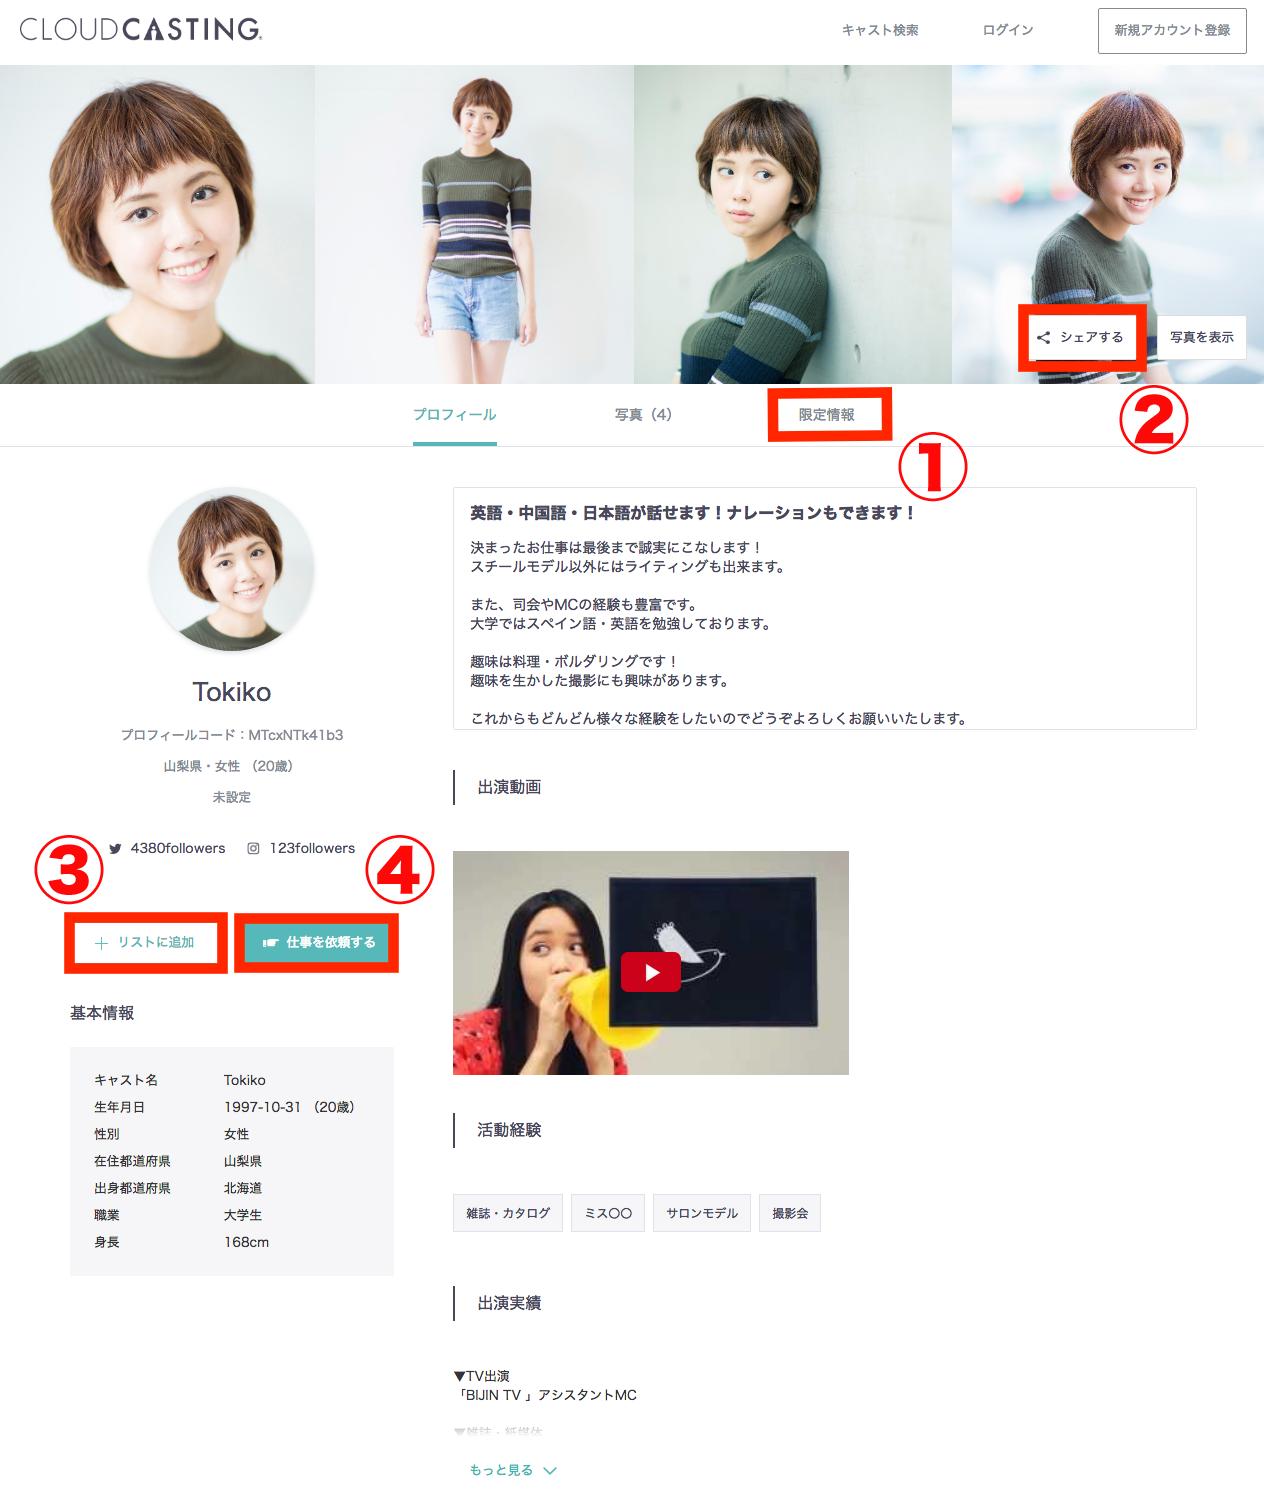 screencapture-cloudcasting-jp-profile-MTcxNTk41b3-2018-06-08-14_40_51 (1)